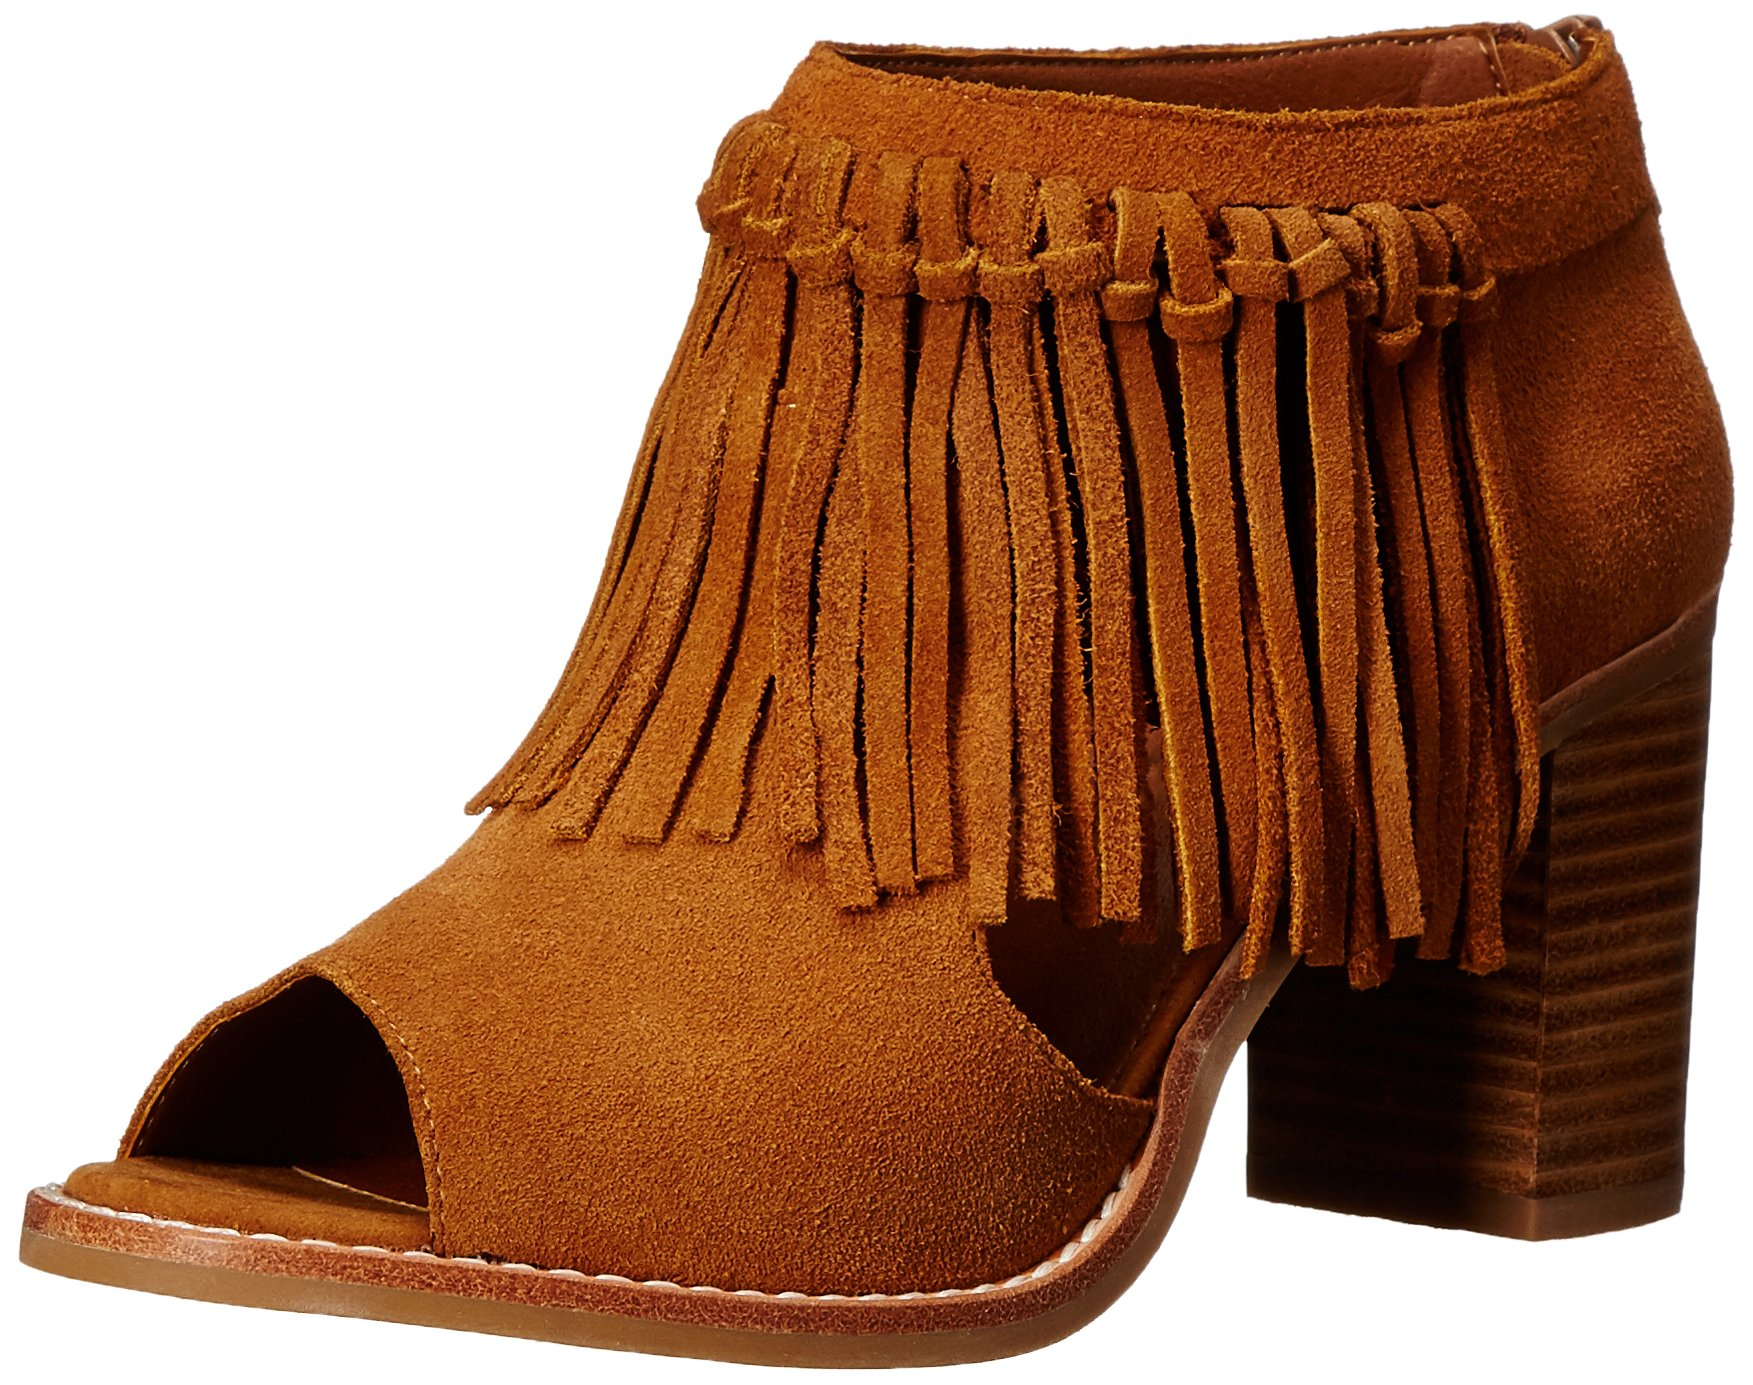 Sbicca Women's Hickory Heeled Sandal, Tan, 9 B US